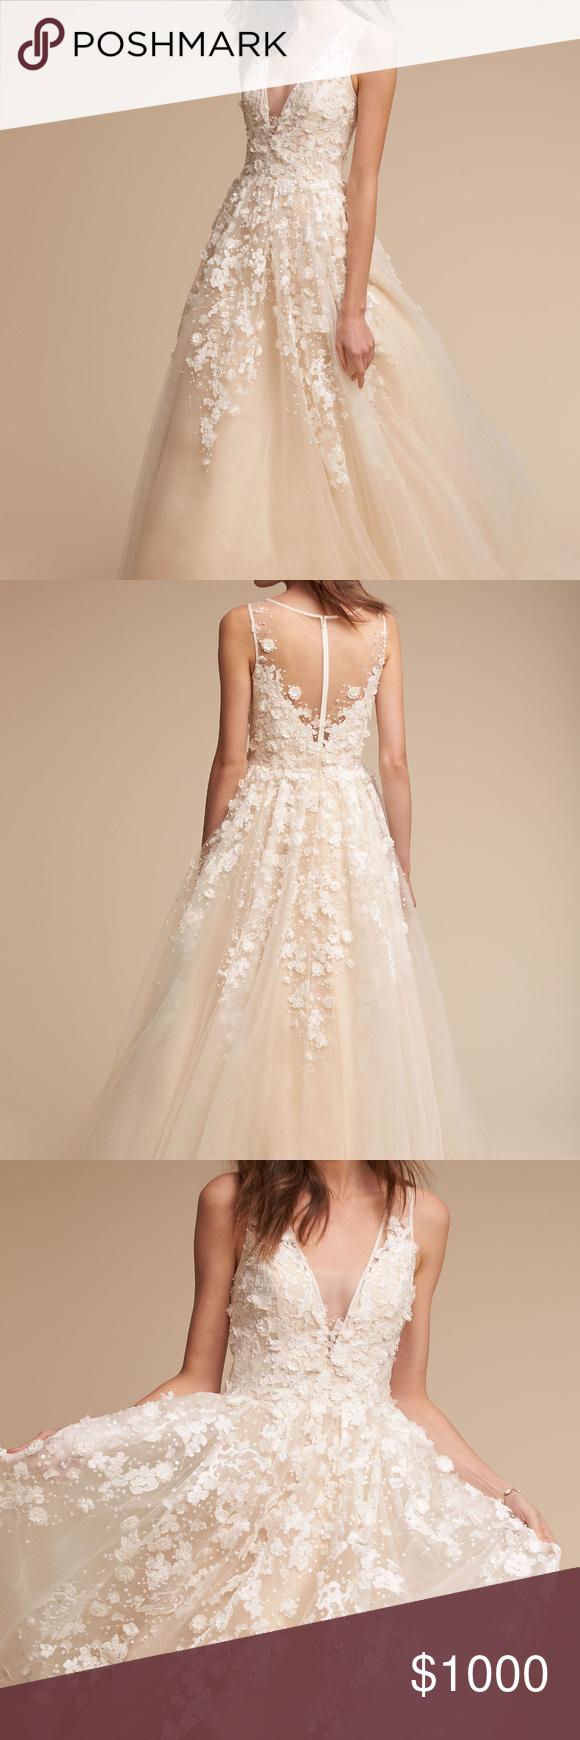 Wedding dress cups  BHLDN Ariane Gown  My Posh Picks  Pinterest  Fashion tips